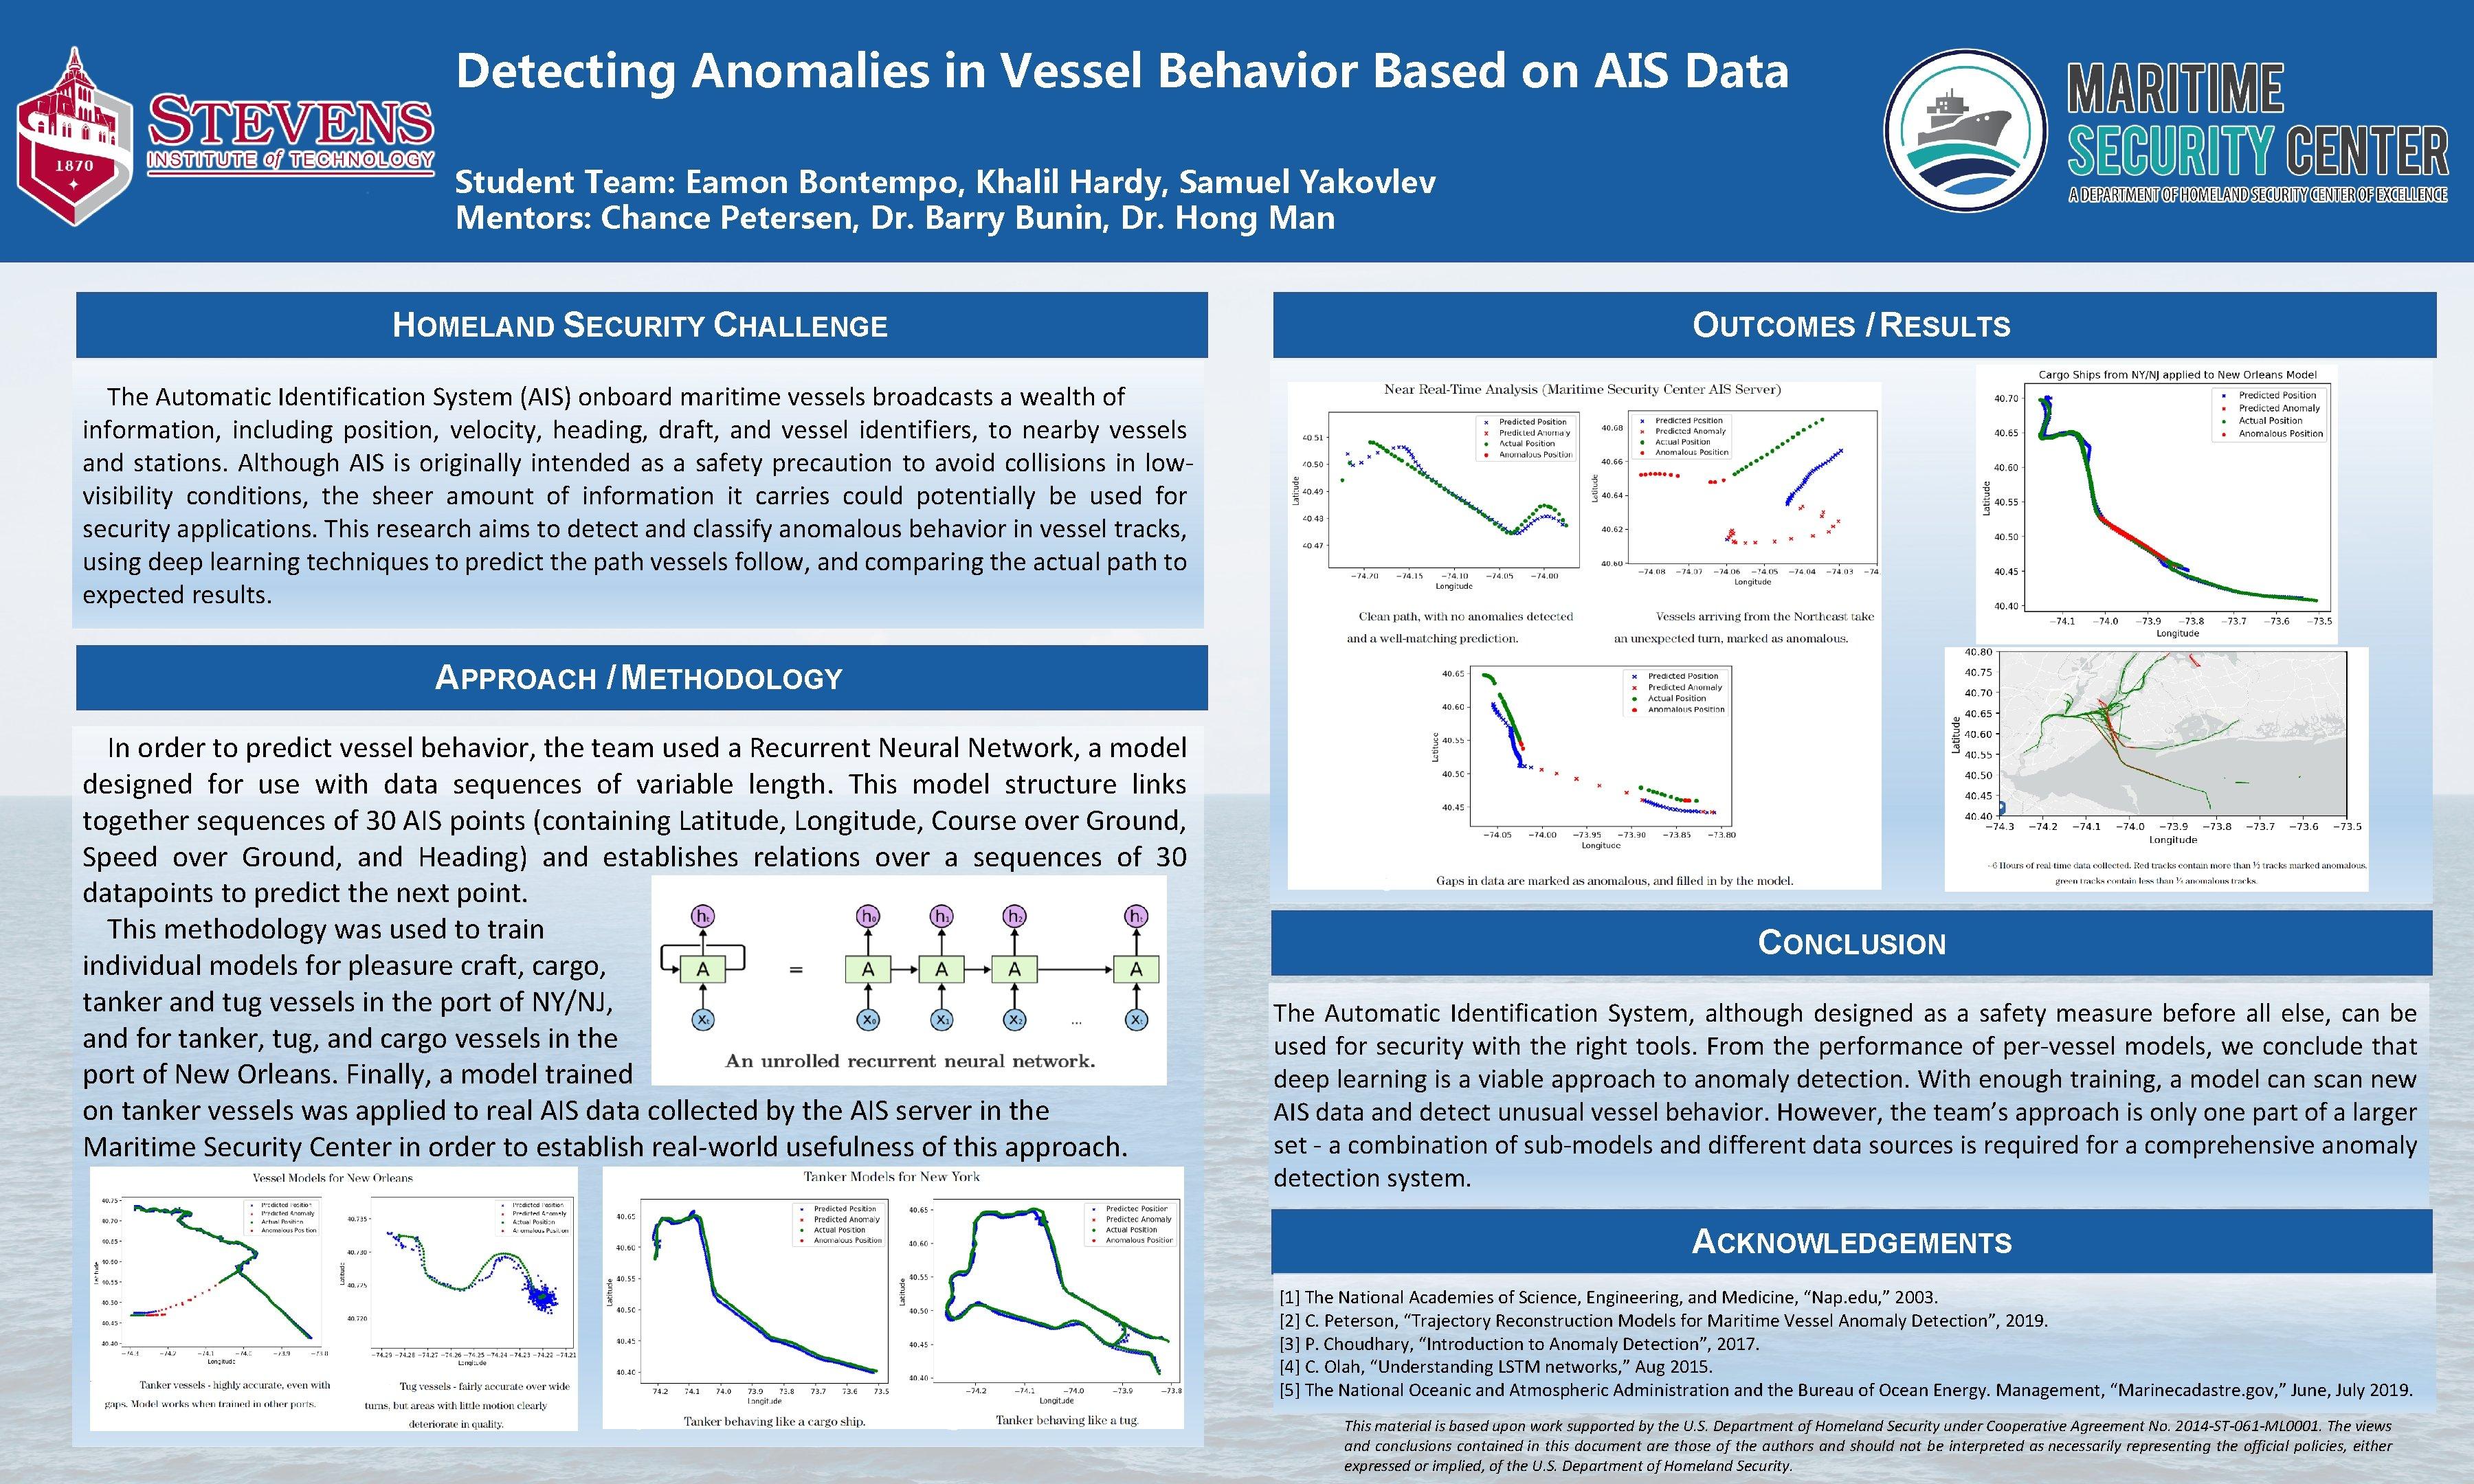 Detecting Anomalies in Vessel Behavior Based on AIS Data Student Team: Eamon Bontempo, Khalil